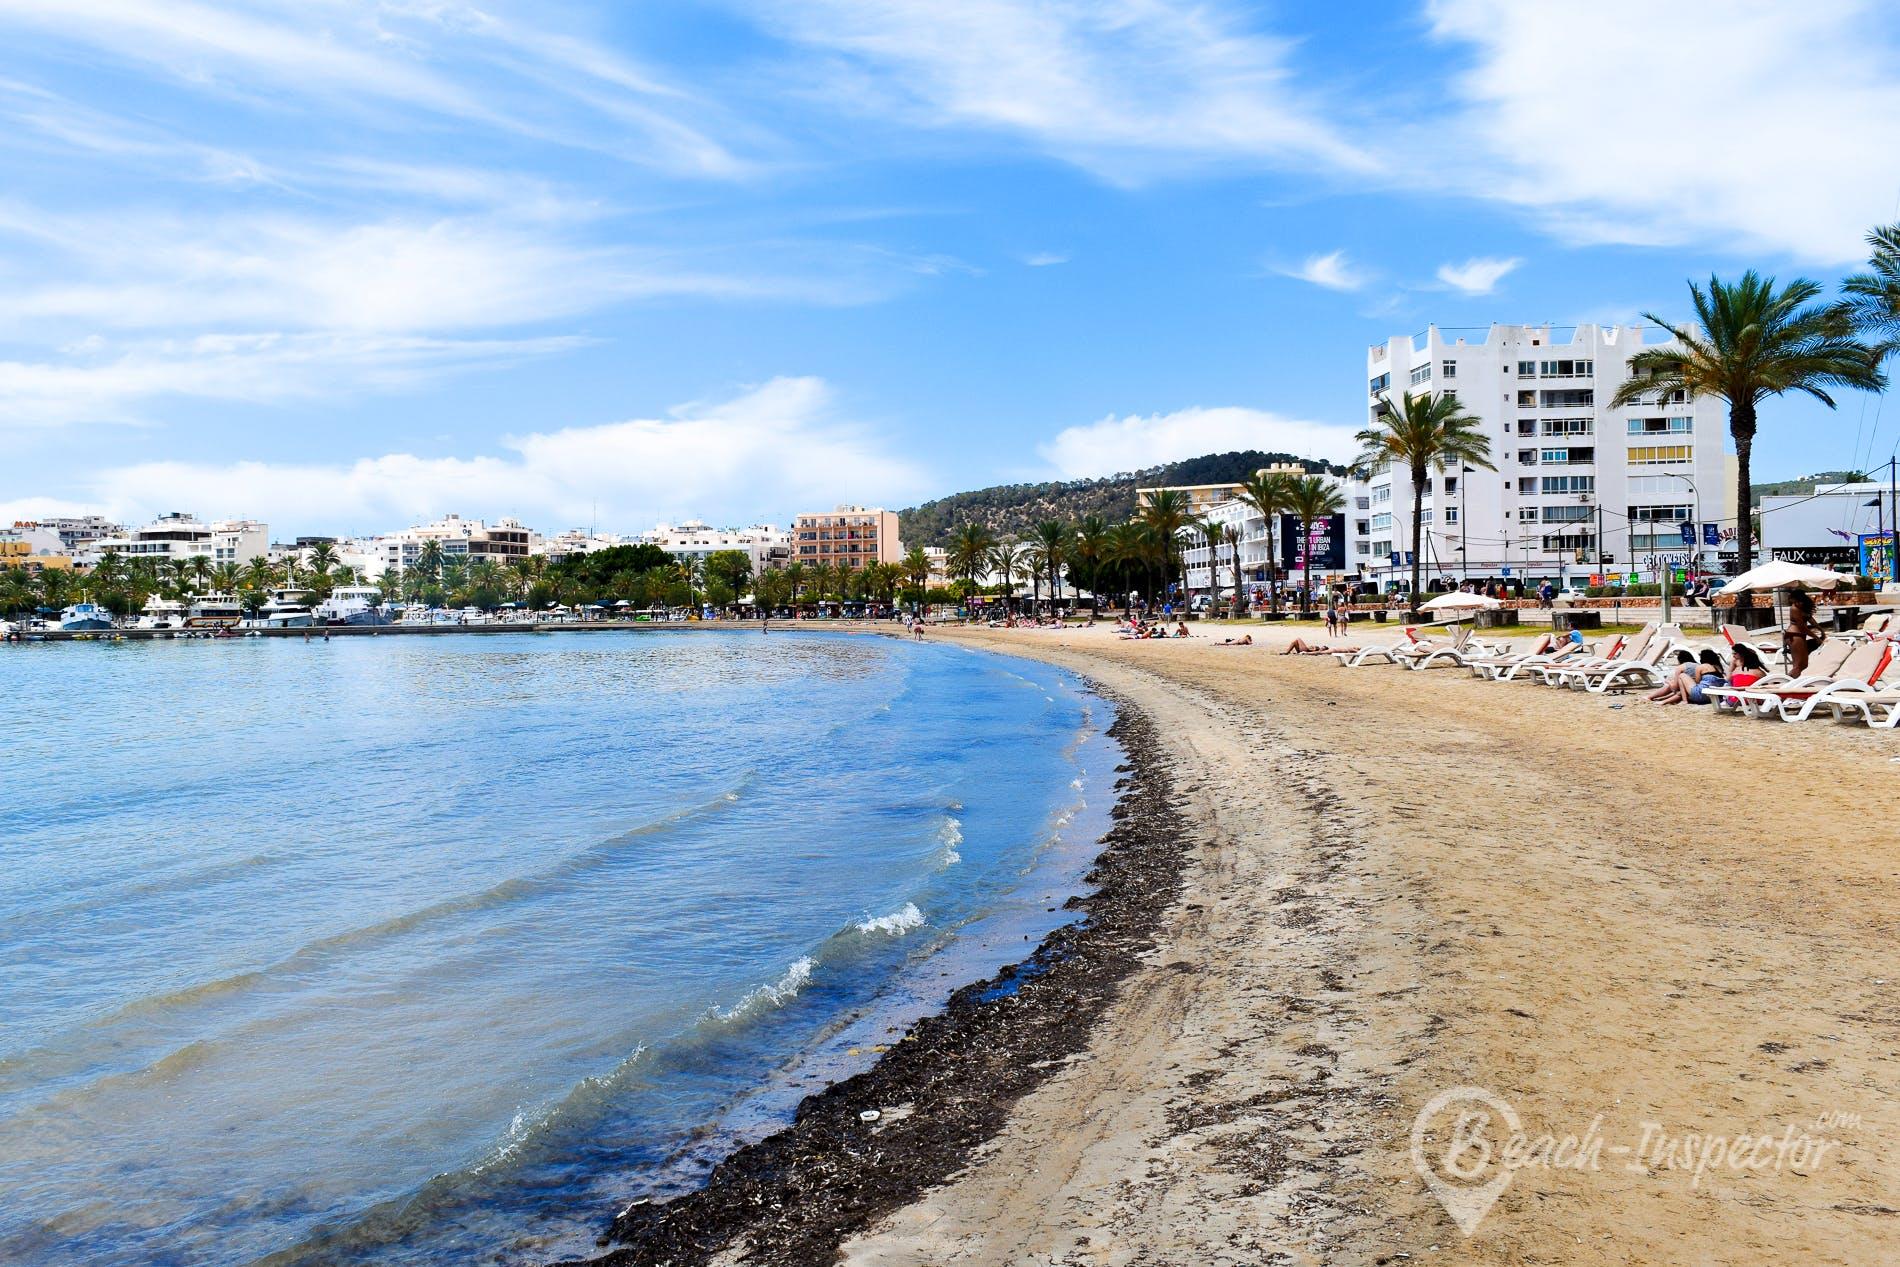 Beach Playa de S'Arenal, Ibiza, Spain